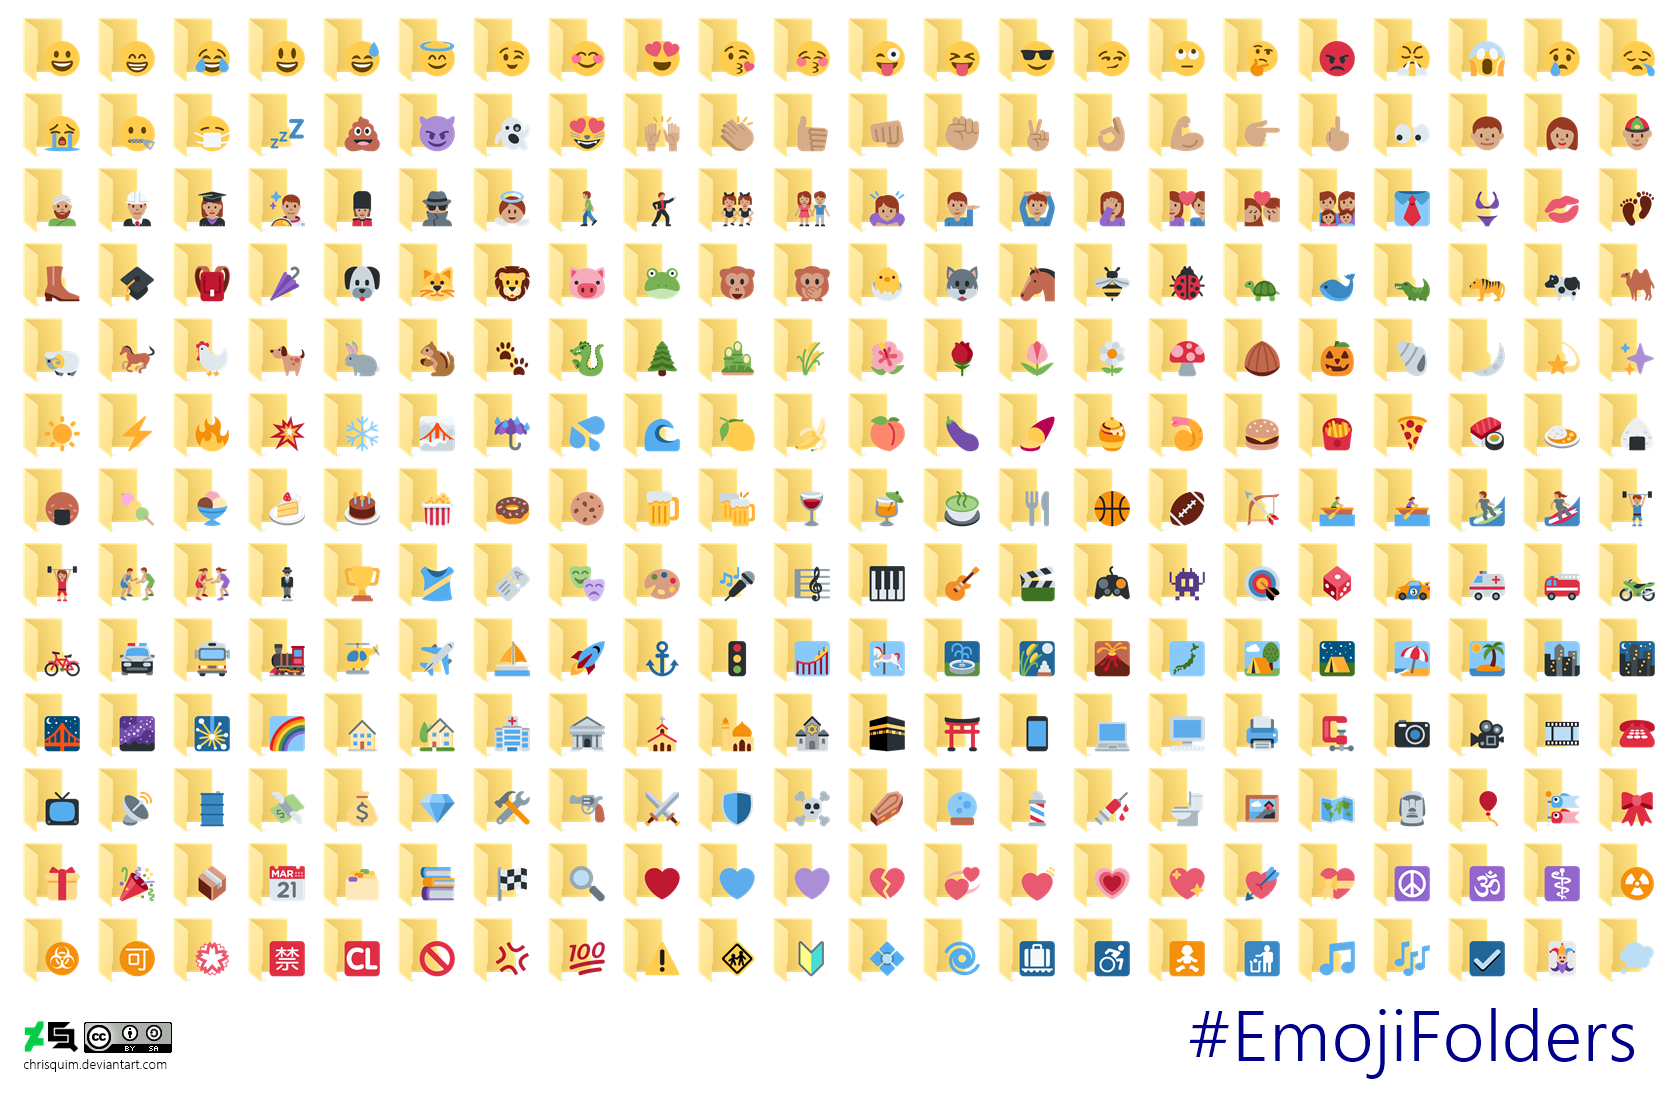 #EmojiFolders - Windows 10 Folder Icon and Twemoji by